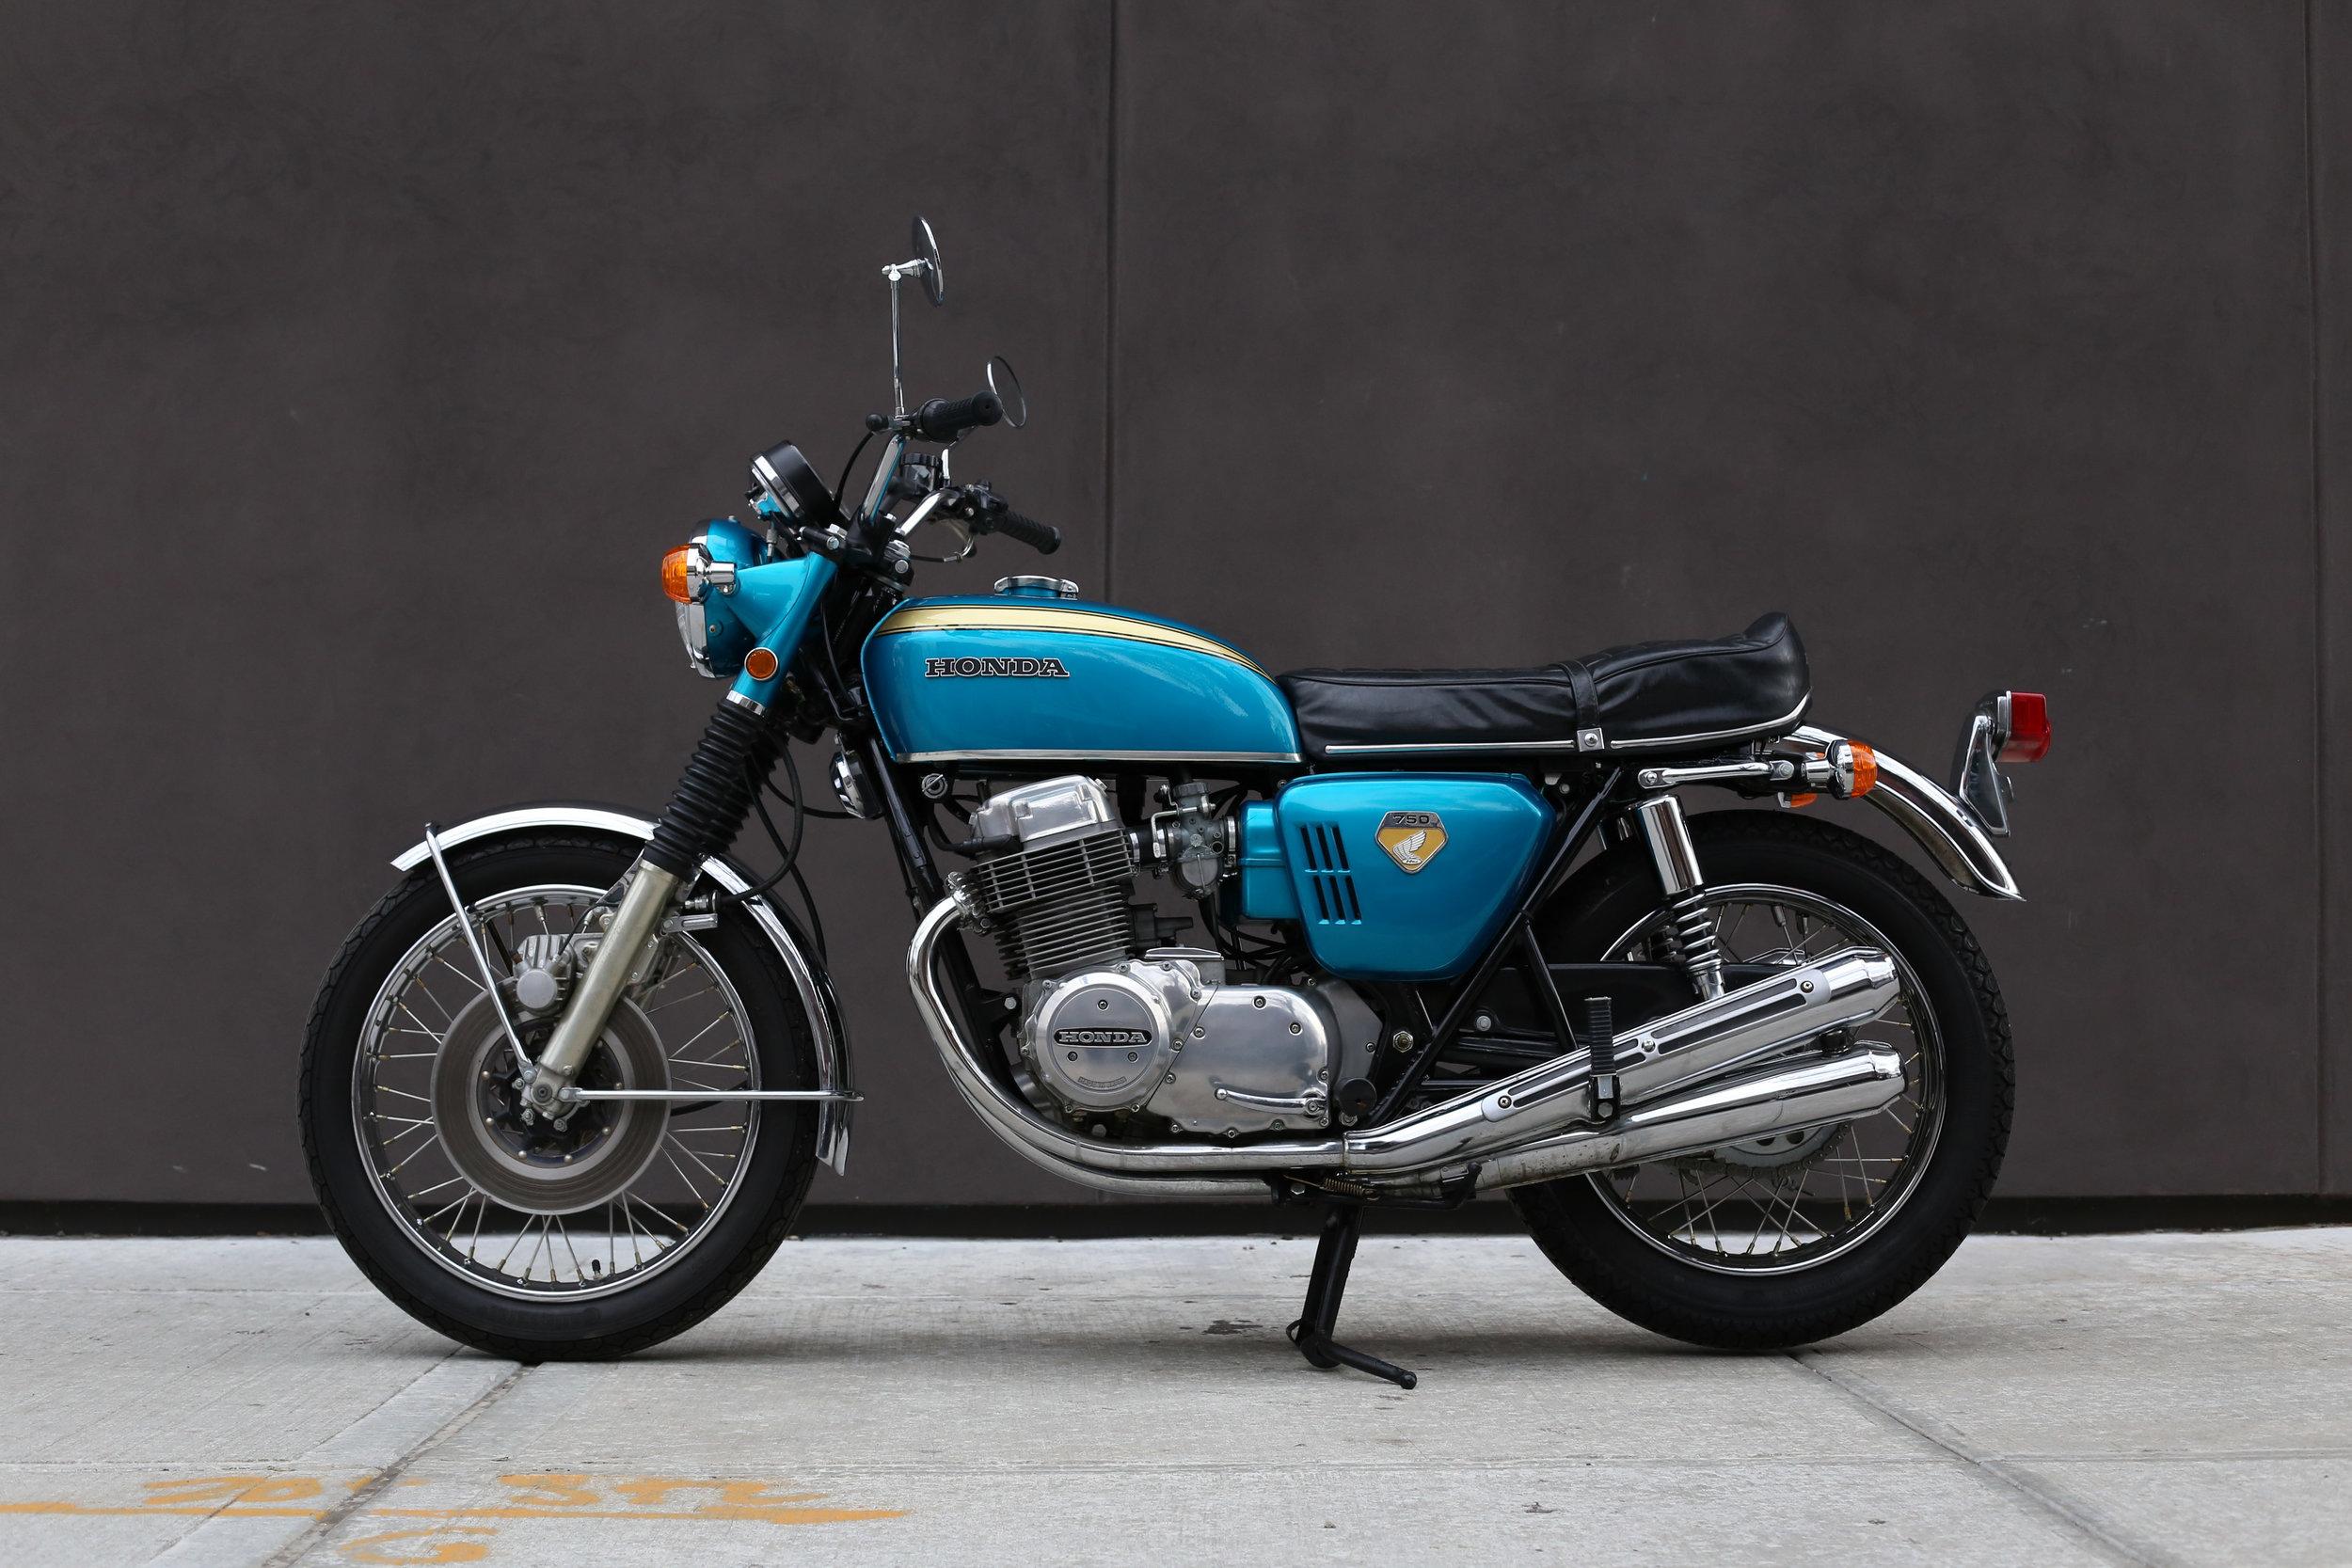 1969 Honda Cb 750 Sandcastsold Motorcycles